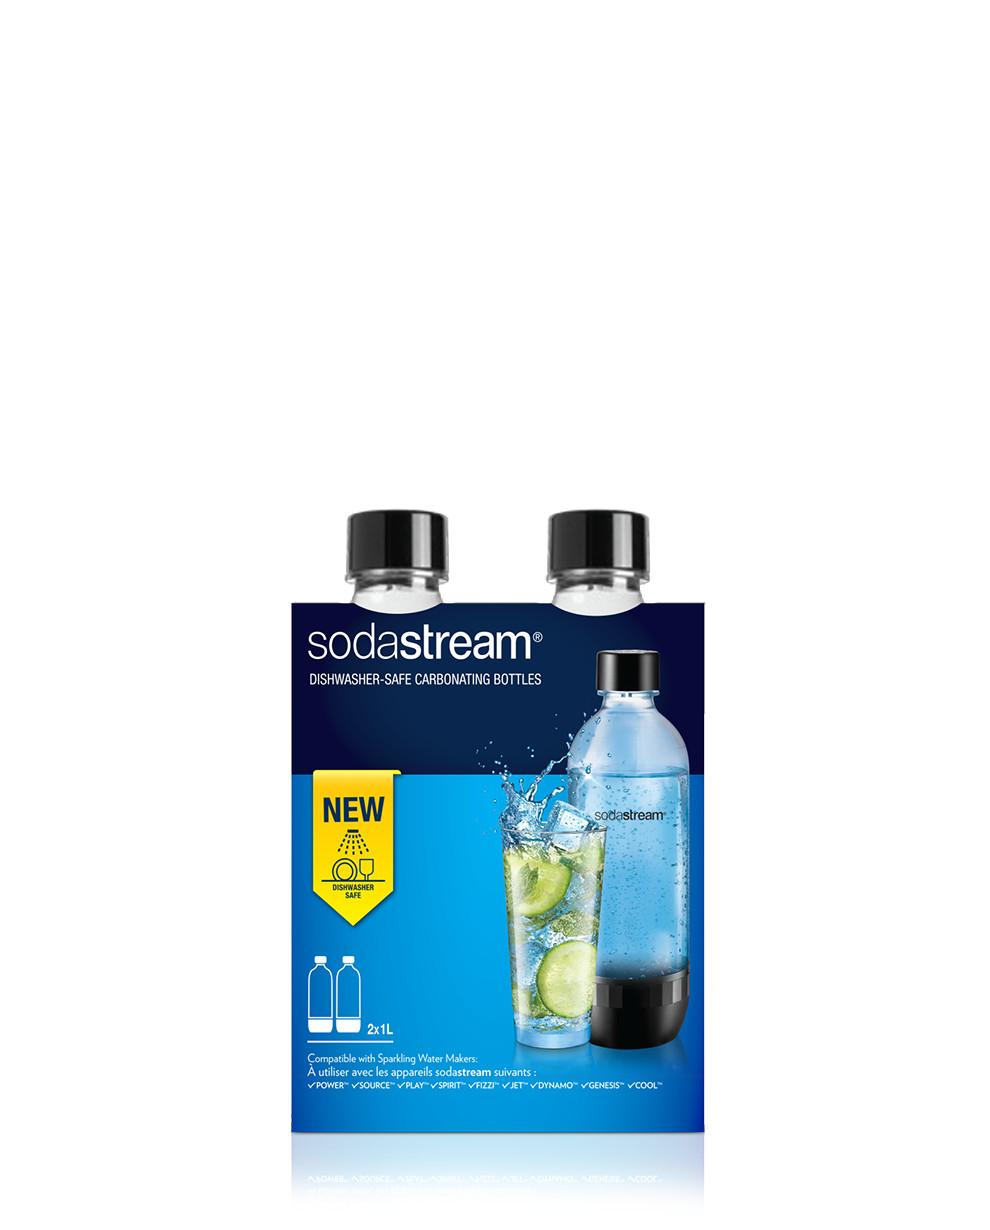 Universali Lavabili In Lavastoviglie SodaStream Pack Da 2 Bottiglie 1 L